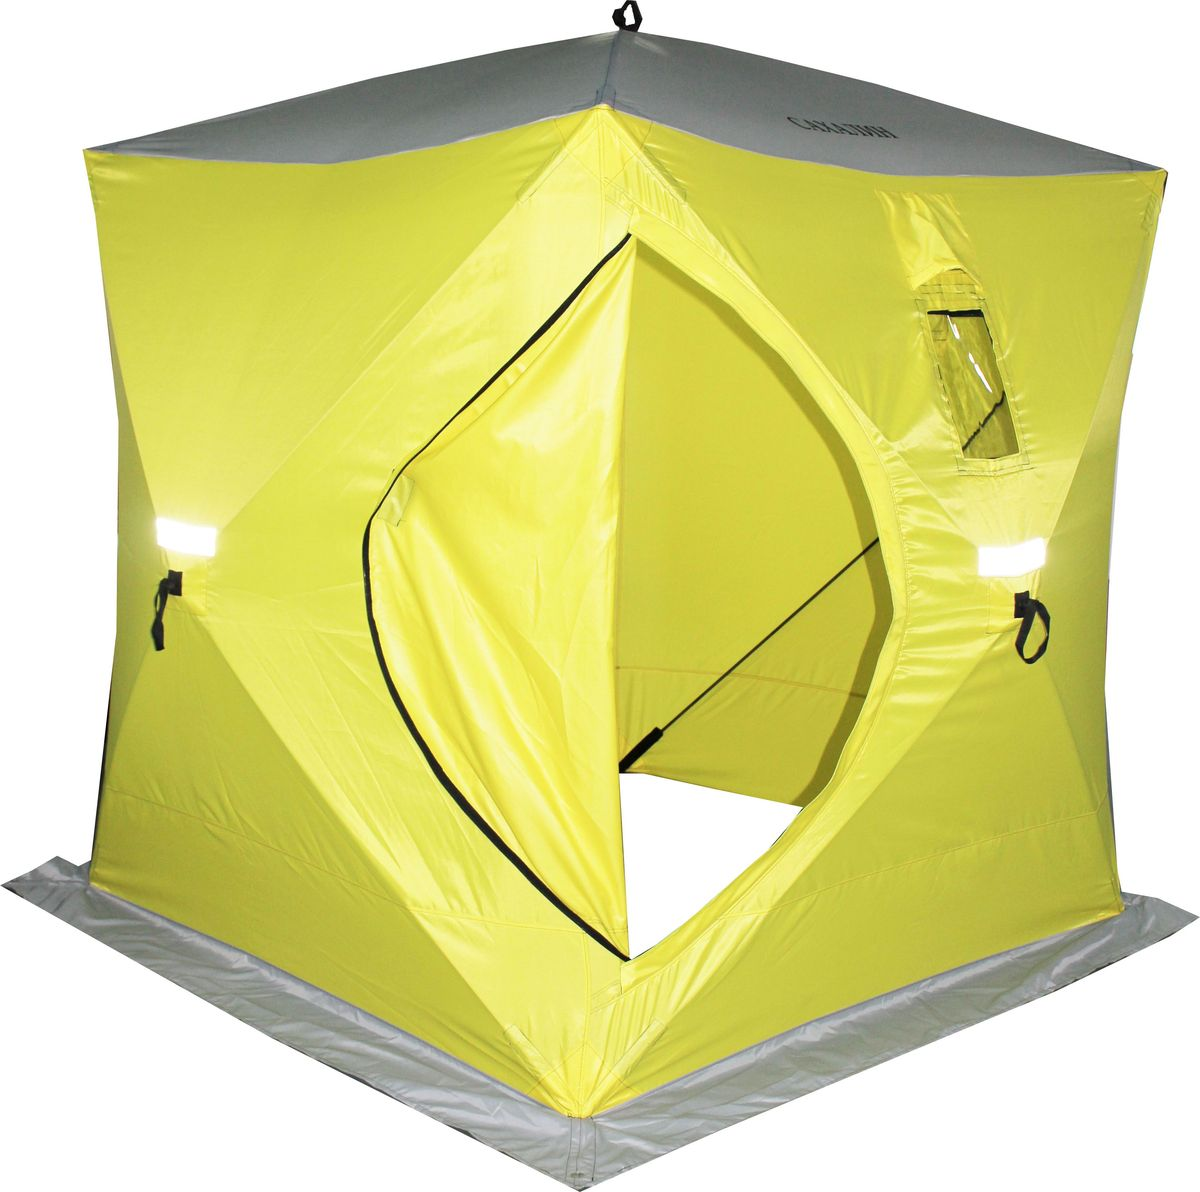 Палатка зимняя Prival Сахалин, 4-местная, цвет: желтый, серый, 180 х 180 х 200 см зимняя палатка медведь 4 купить